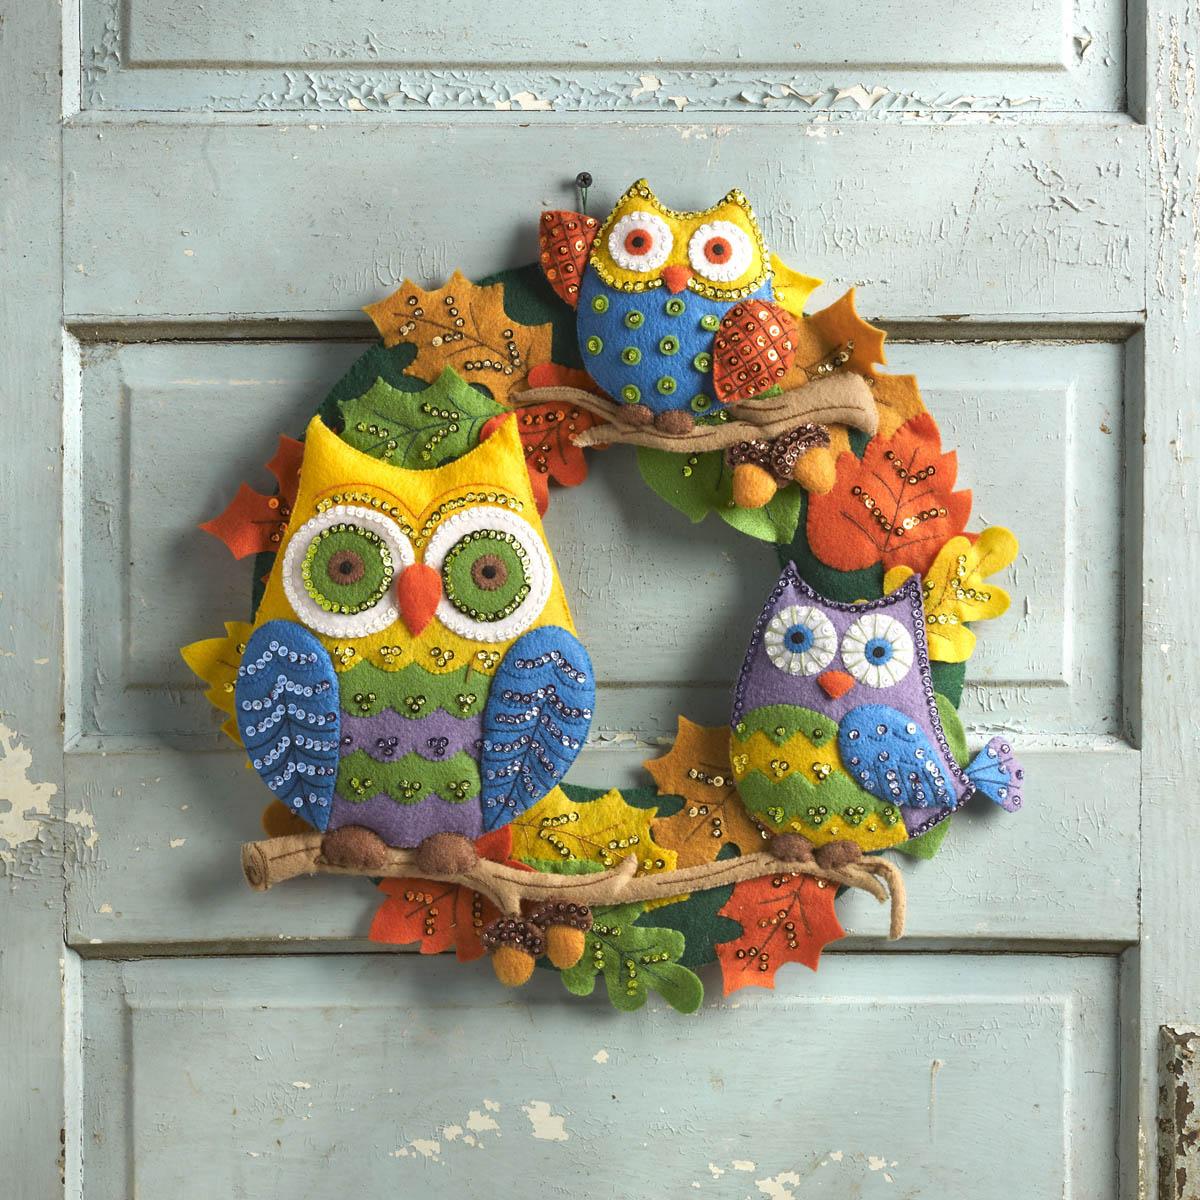 Shop Plaid Bucilla Seasonal Felt Home Decor Owl Wreath